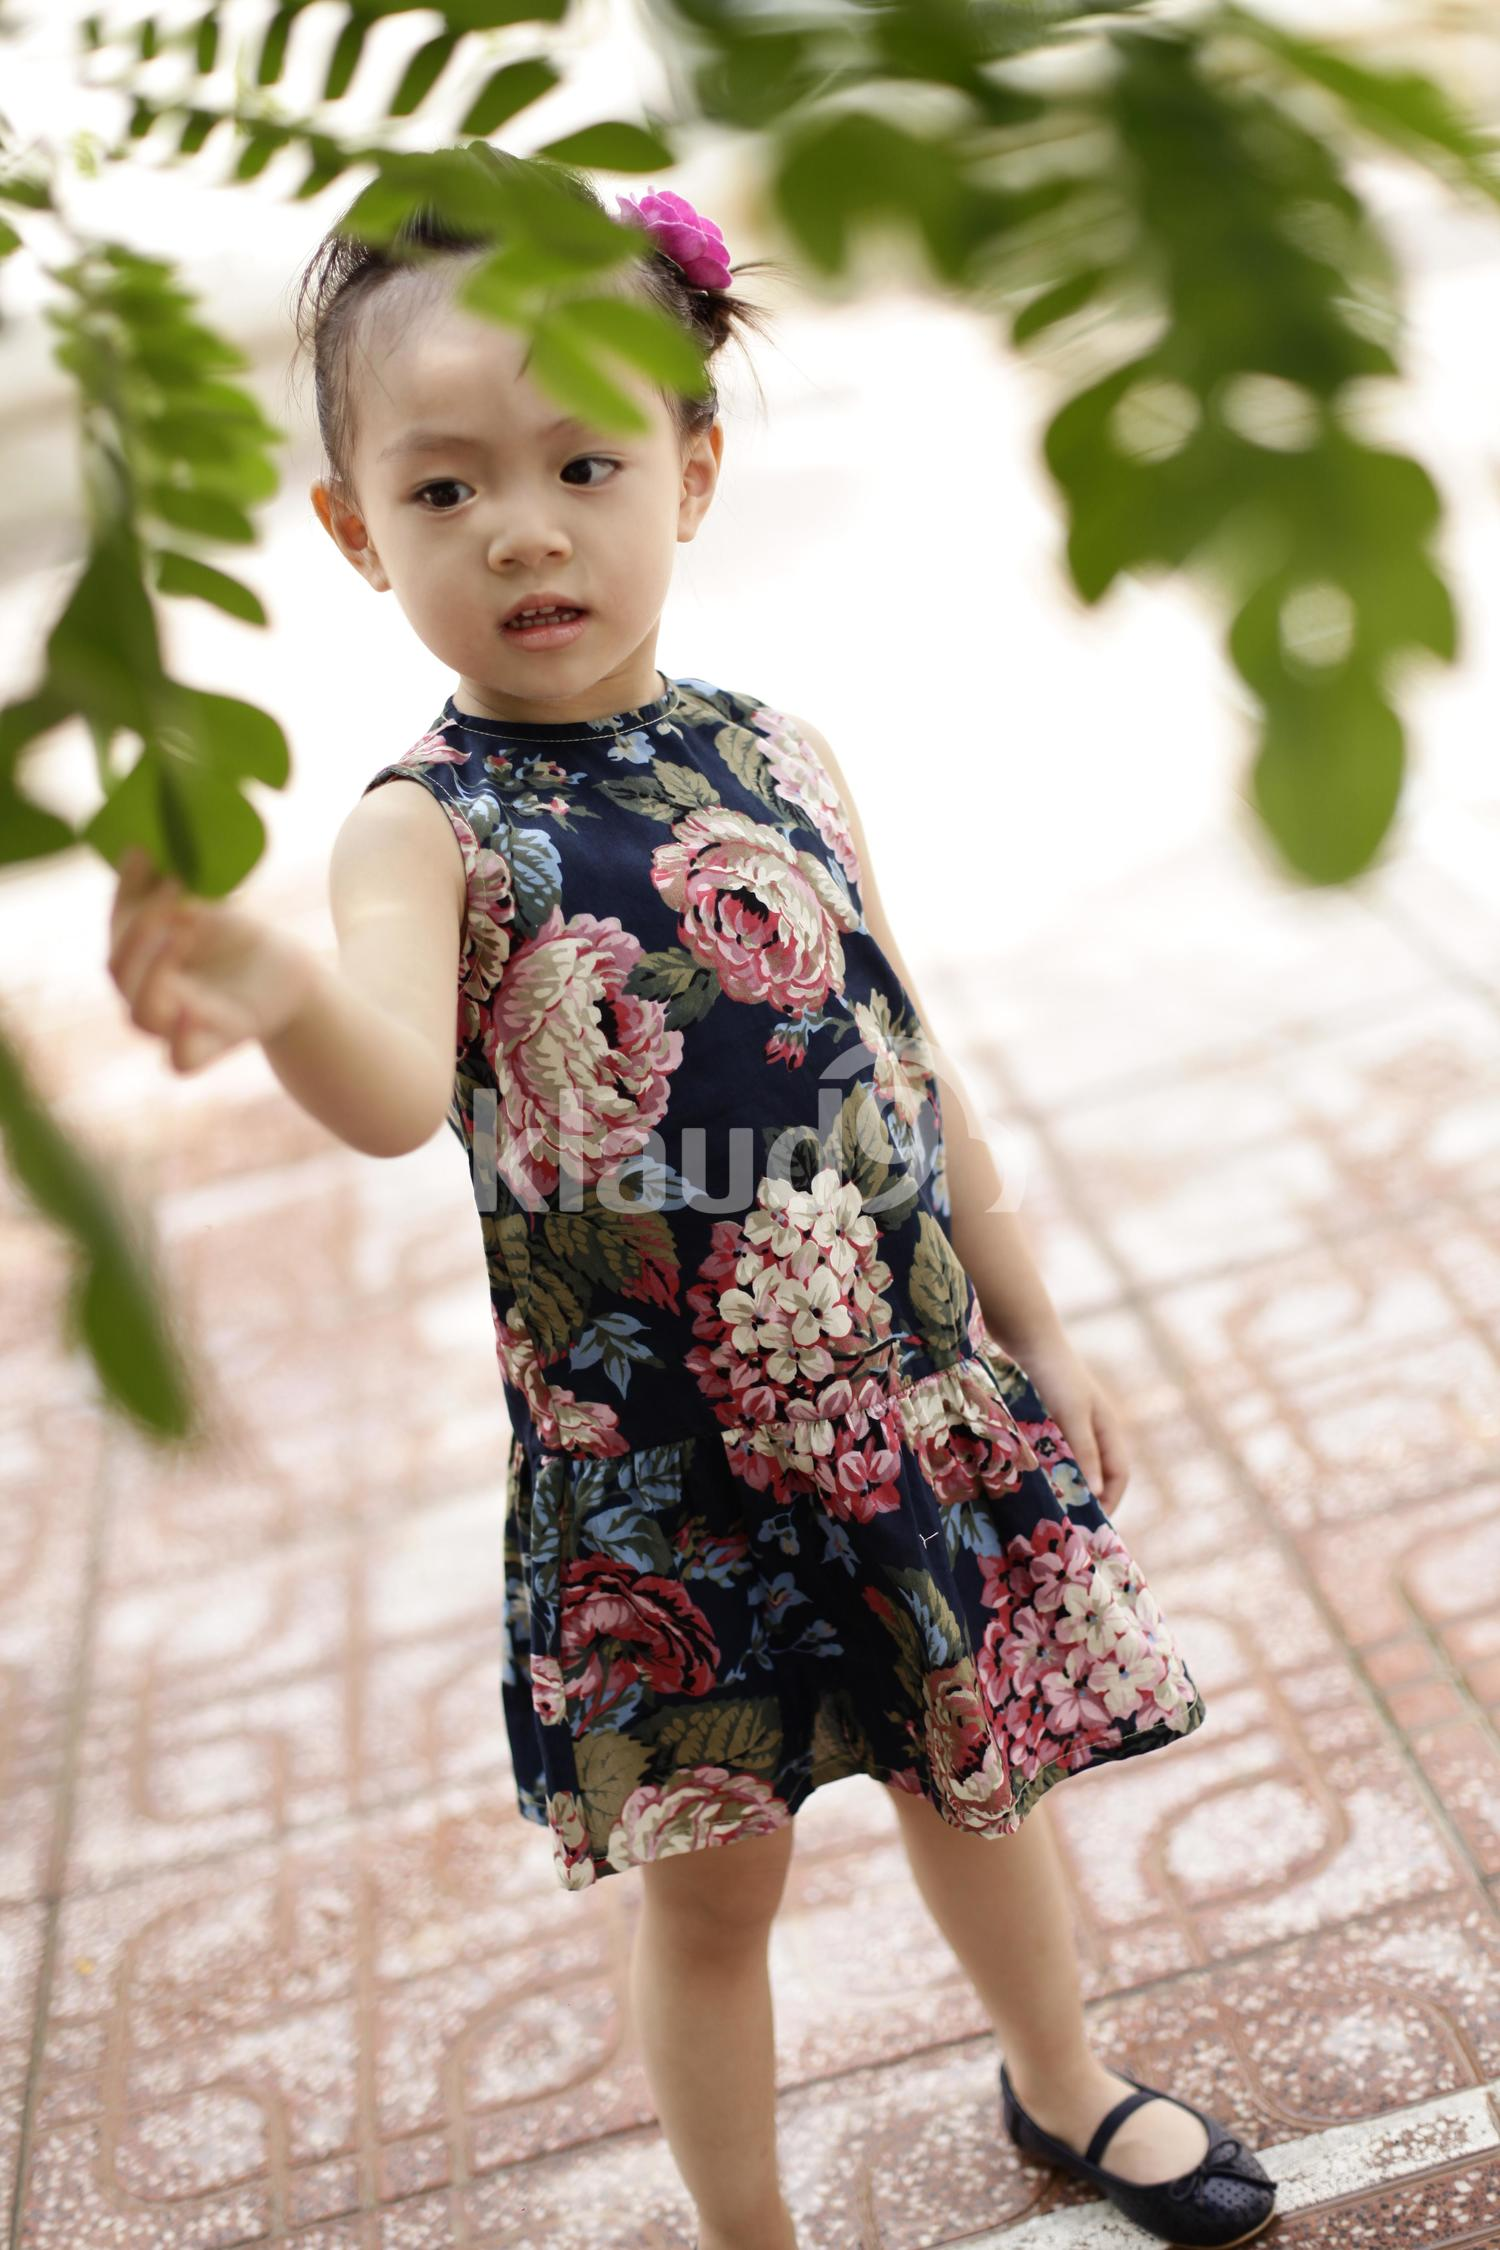 Cute Vietnamesse little girl in floral dress